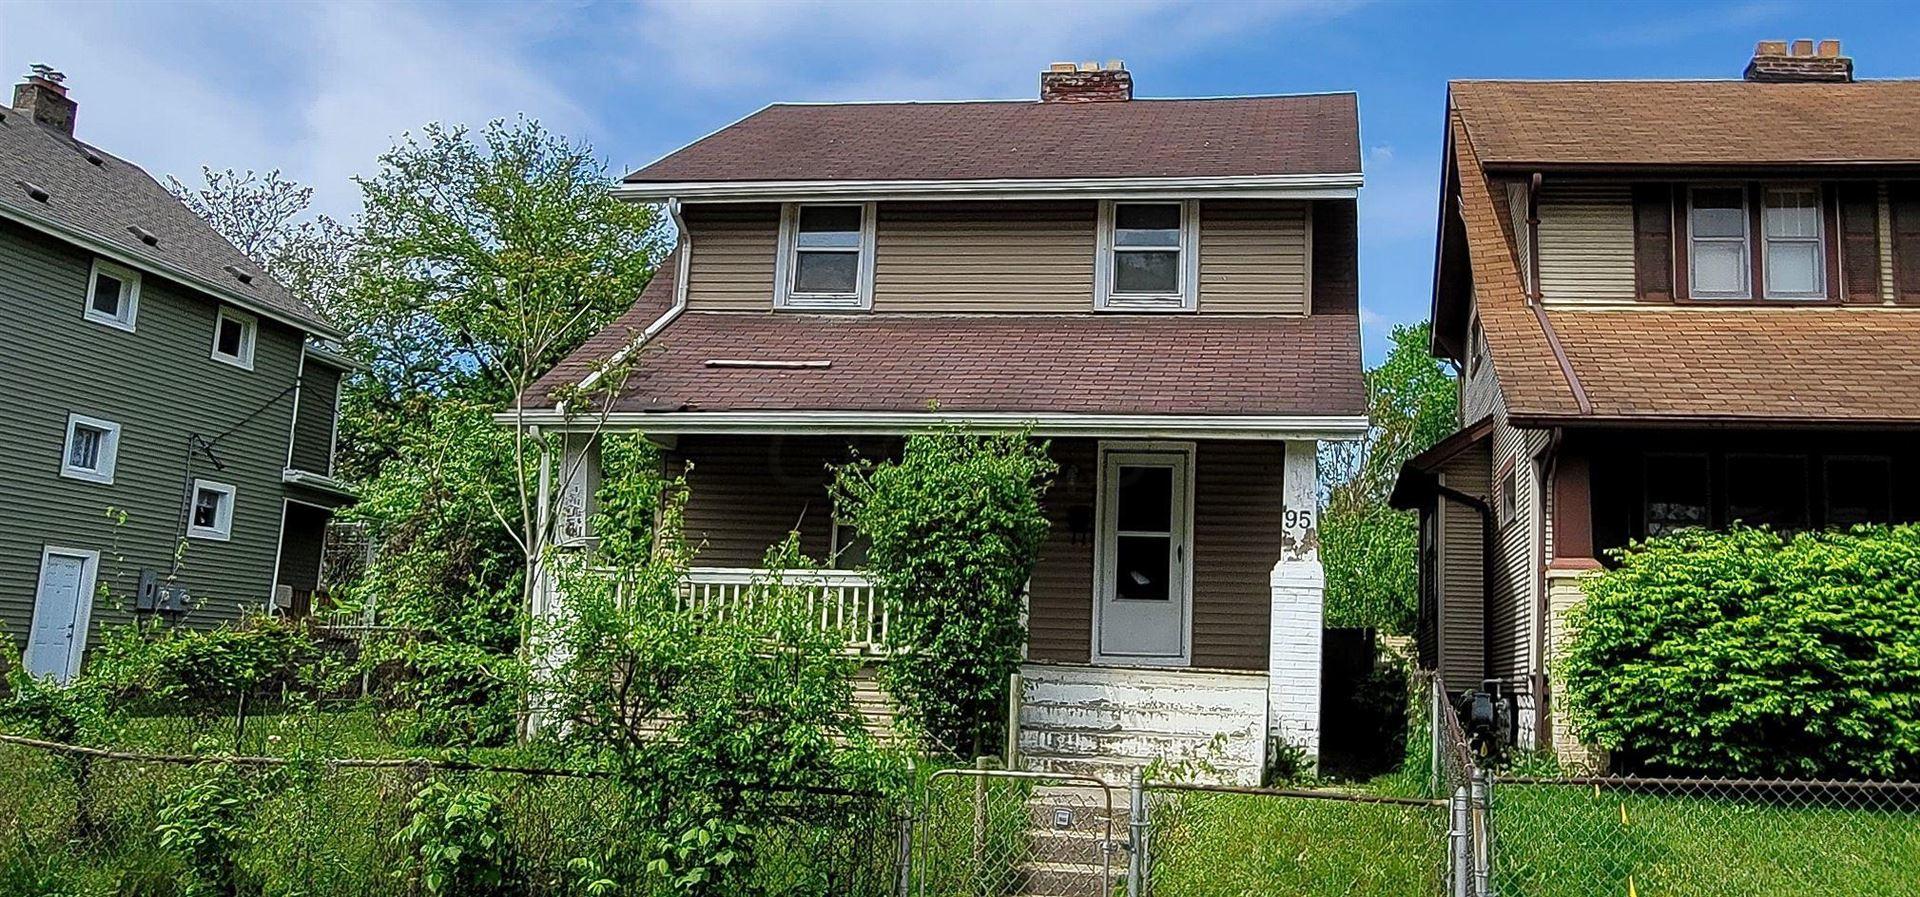 Photo of 95 S Eureka Avenue, Columbus, OH 43204 (MLS # 221015921)